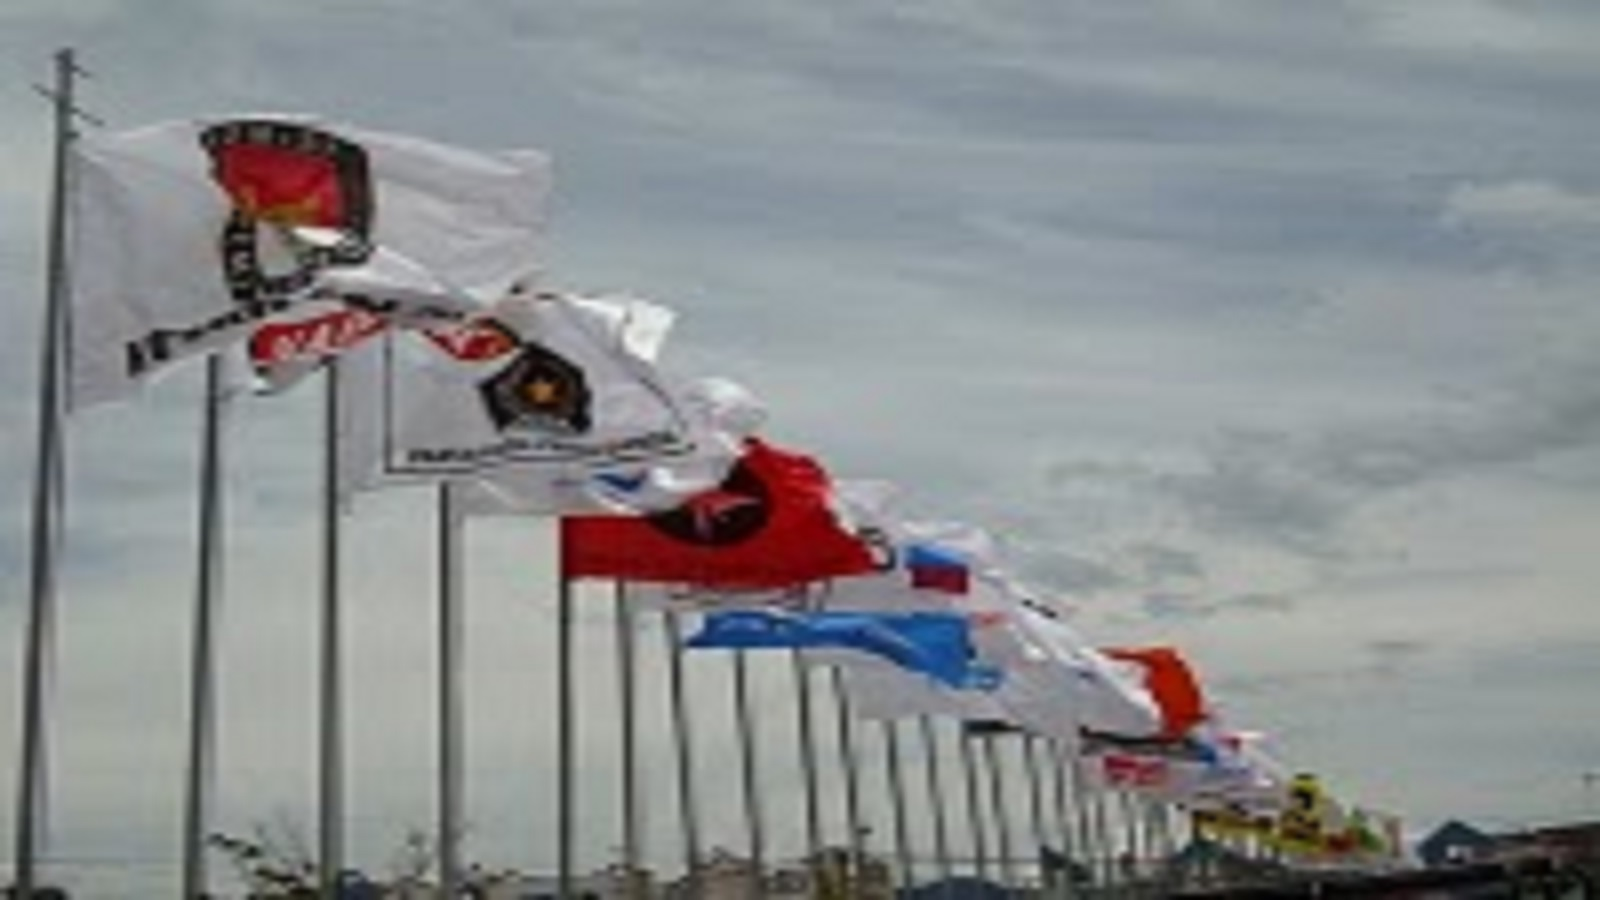 Sistem Kepartaian di Indonesia: Kritik Terhadap Sistem Multi Partai